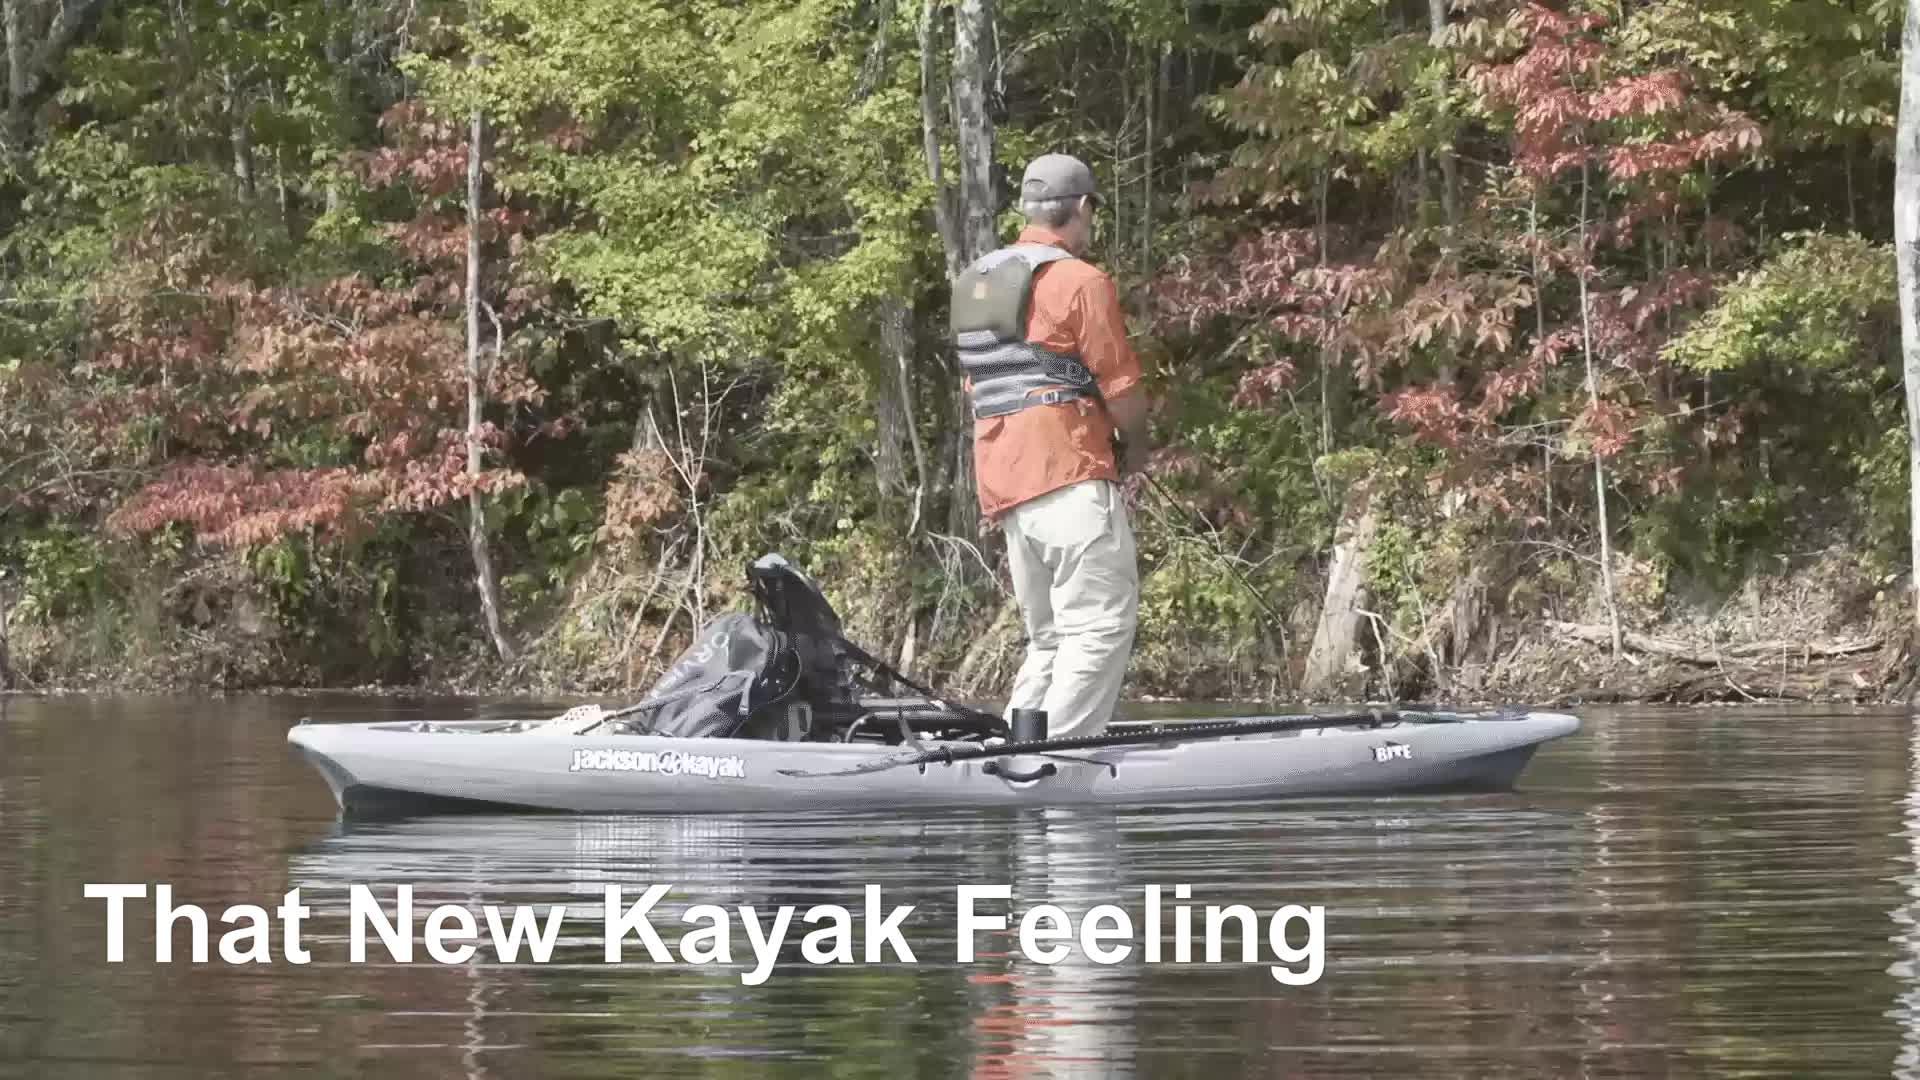 dance, kayak, kayak fishing, Jackson Bite Dance GIFs